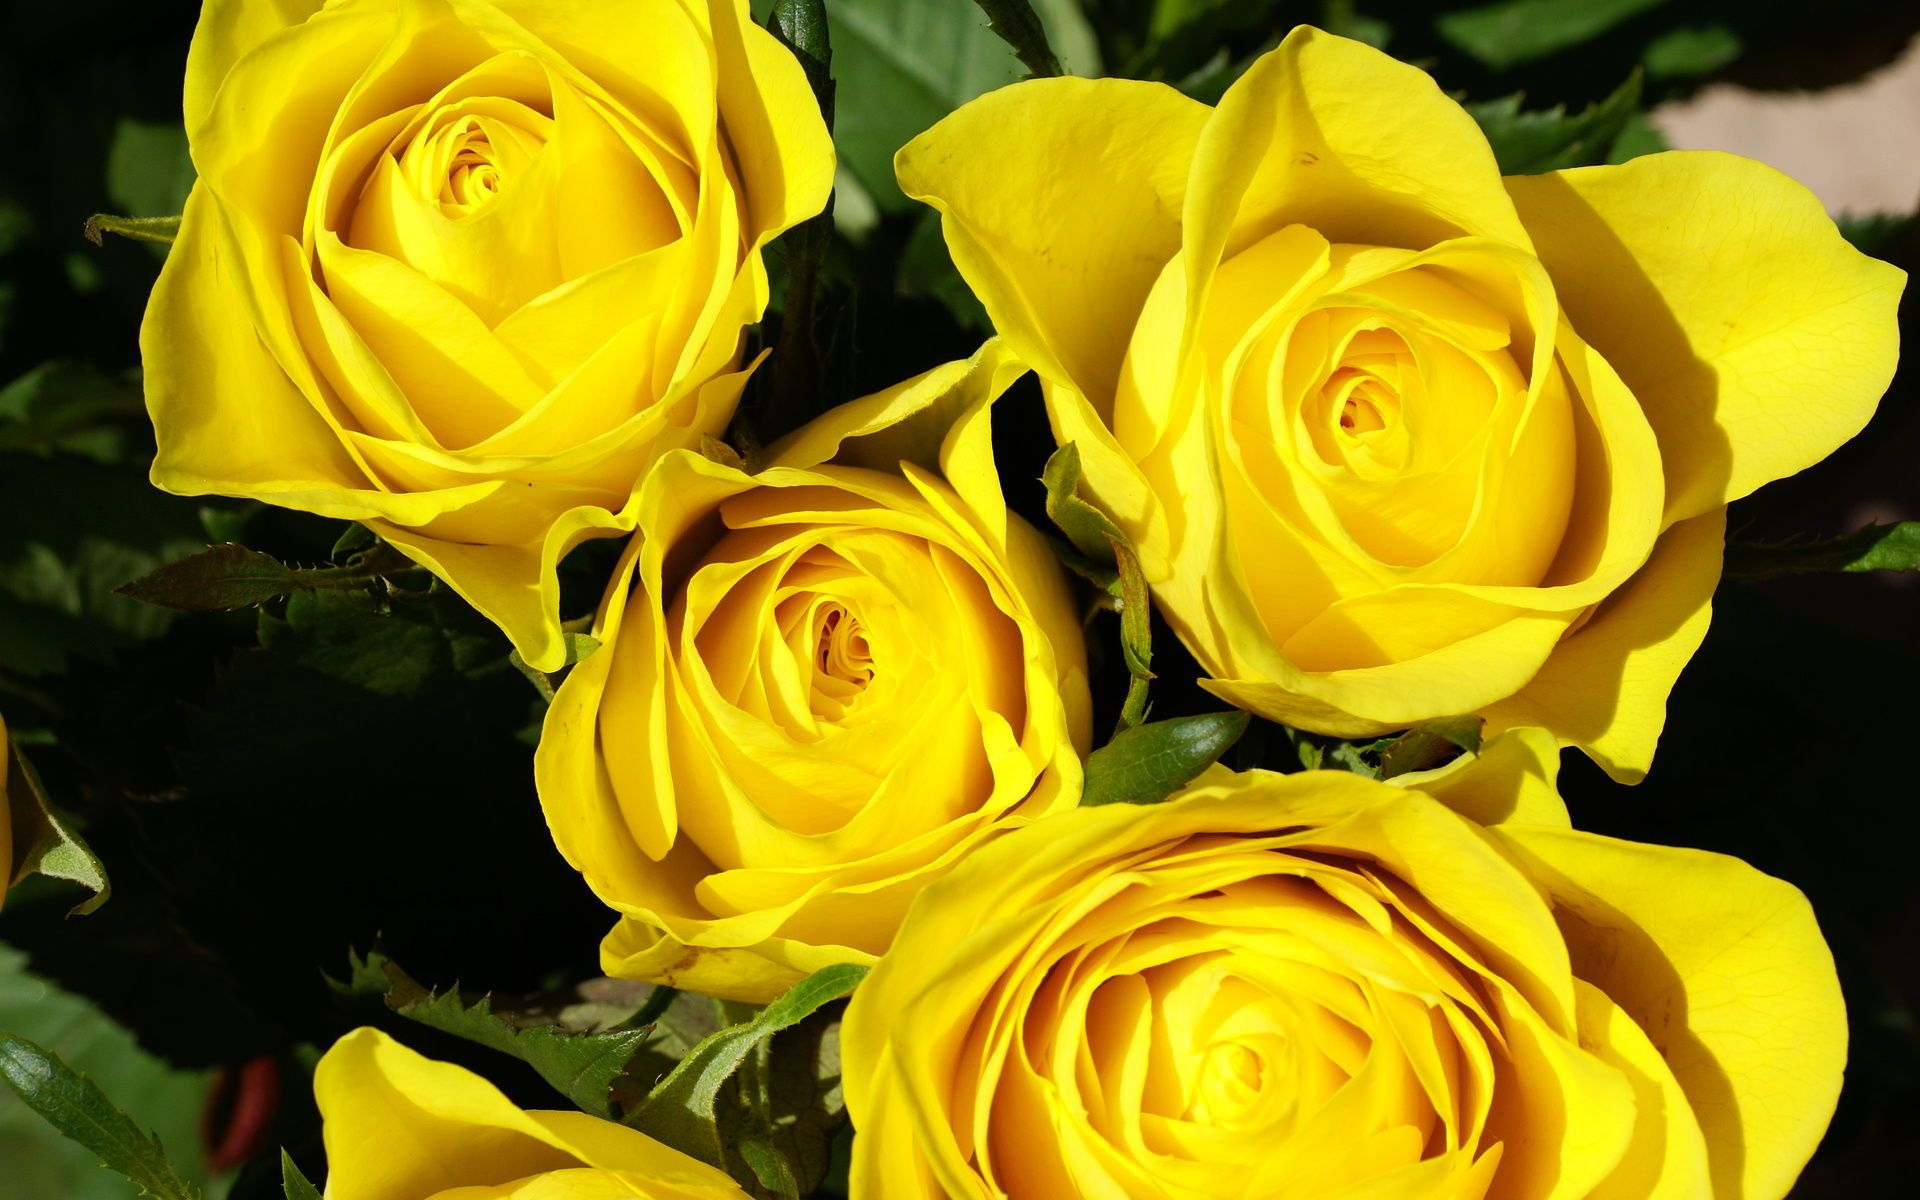 Hd Yellow Roses Wallpaper, Roses, Yellow, Nature, Beautiful, - Yellow And Black Rose , HD Wallpaper & Backgrounds